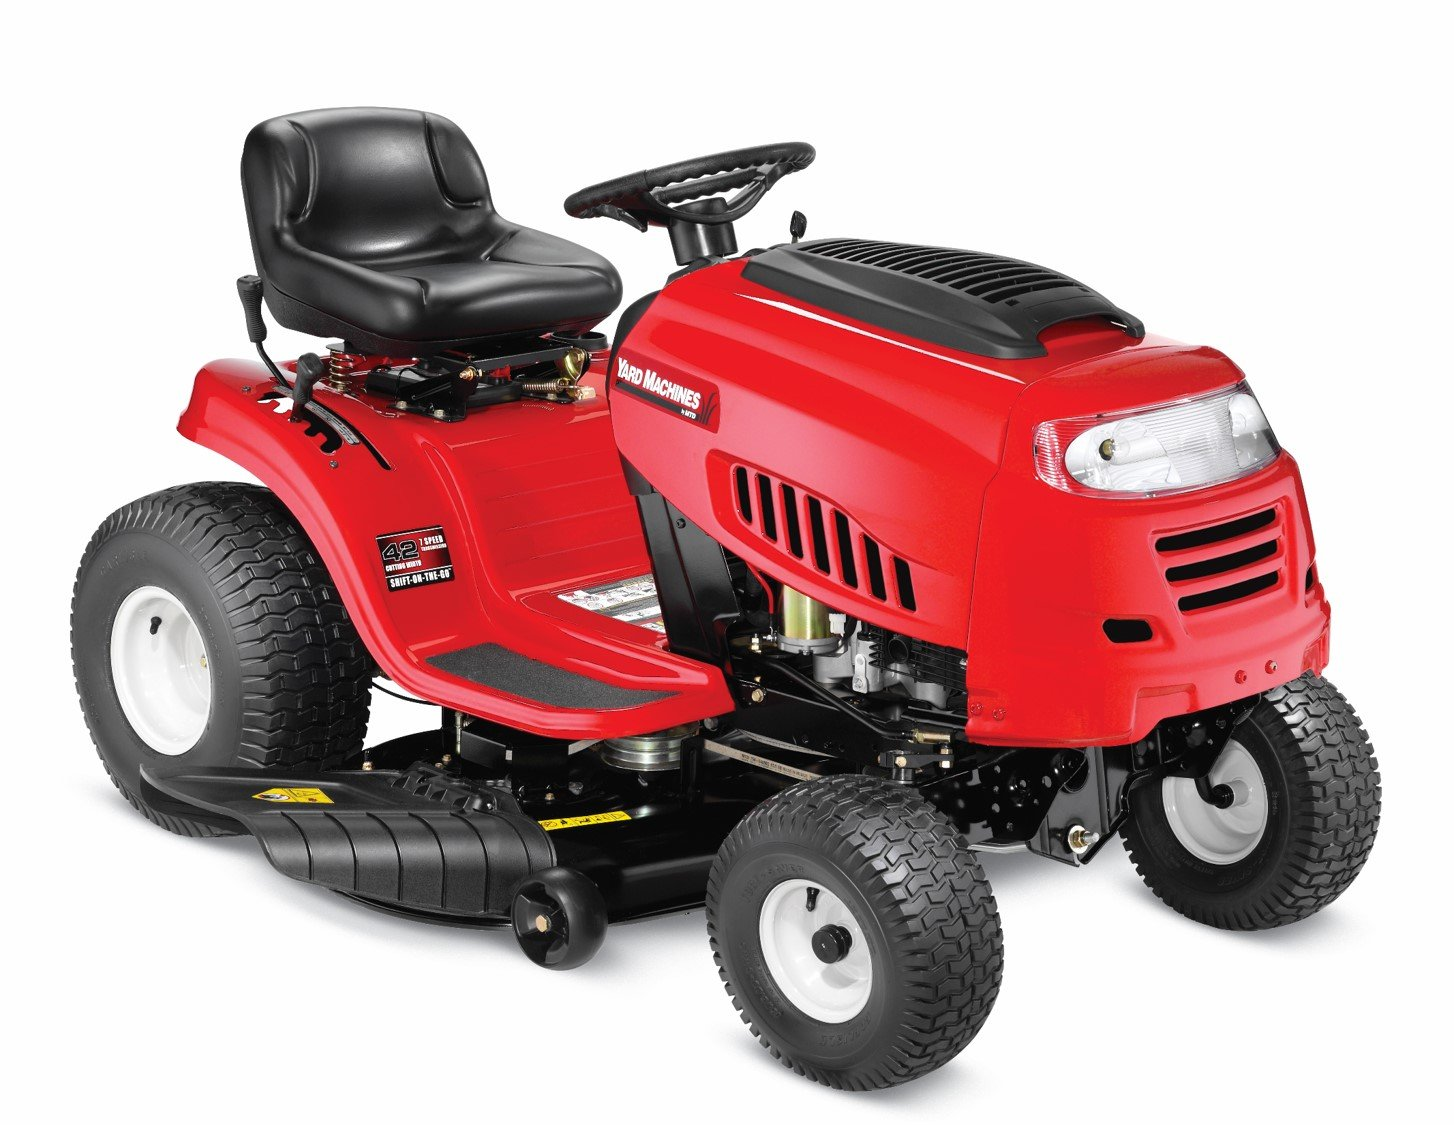 yard machine 42 inch riding mower reviews